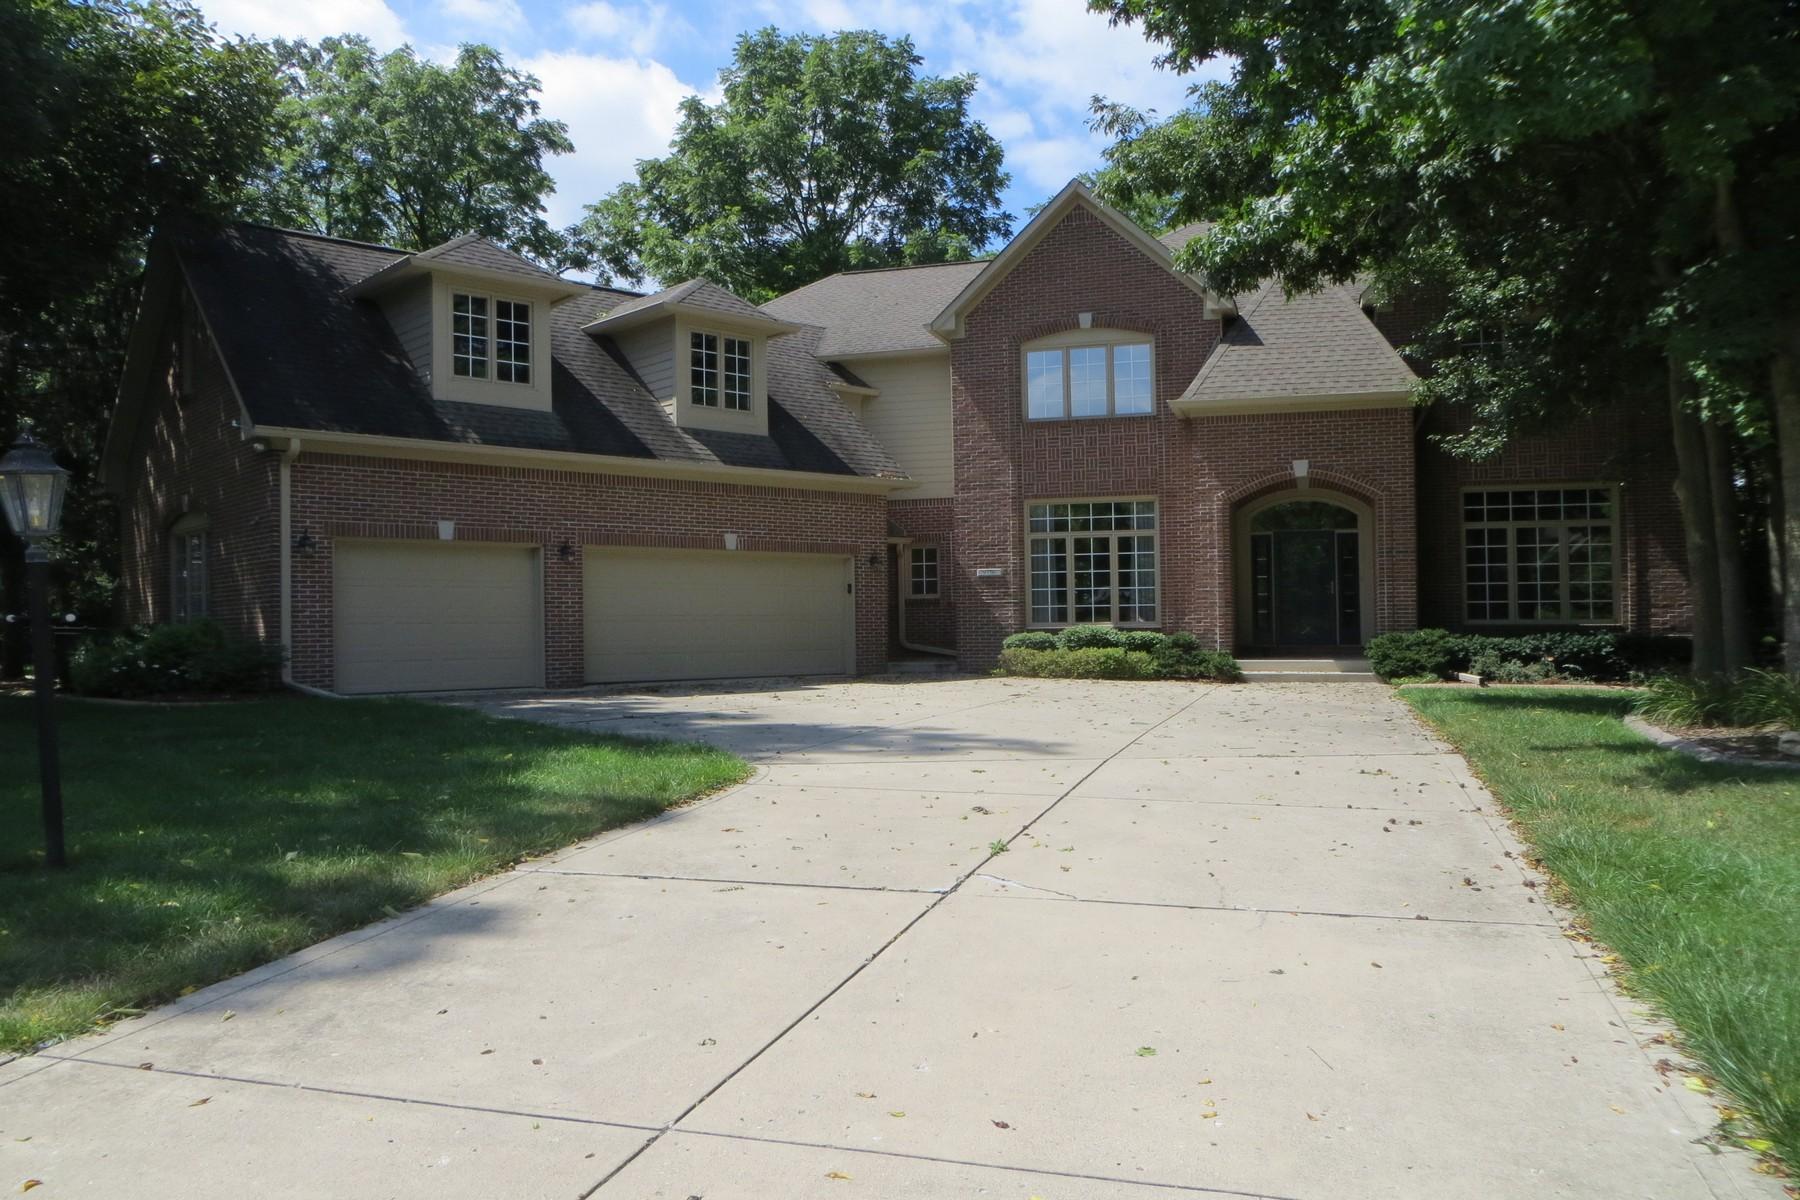 Single Family Homes για την Πώληση στο Spectacular Custom Home in Fishers 9756 Woodlands Drive, Fishers, Ιντιανα 46037 Ηνωμένες Πολιτείες